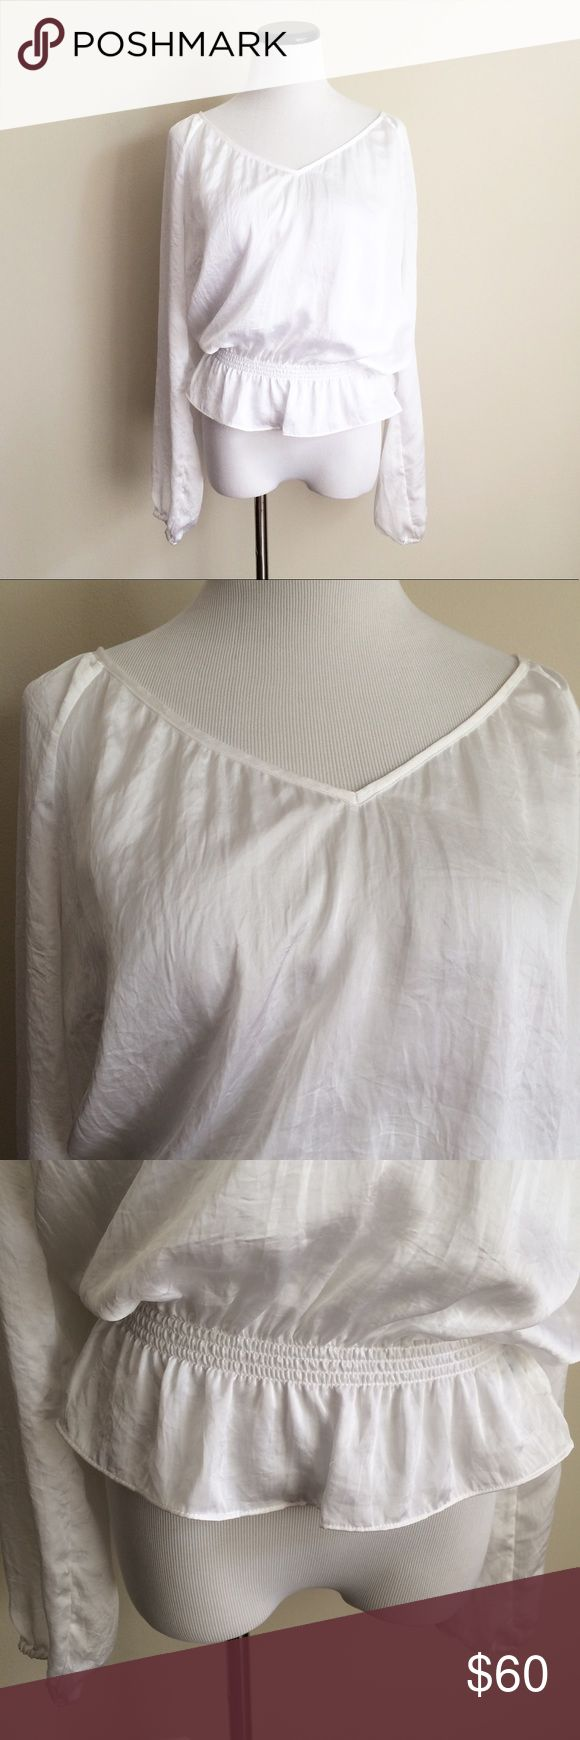 "MICHAEL KORS White ruffle long sleeve Peplum Top Gently worn and has been dry cleaned. White 100% polyester peplum top. Slight v-neck. Length 23"". Chest 21.5"". MICHAEL Michael Kors Tops Blouses"